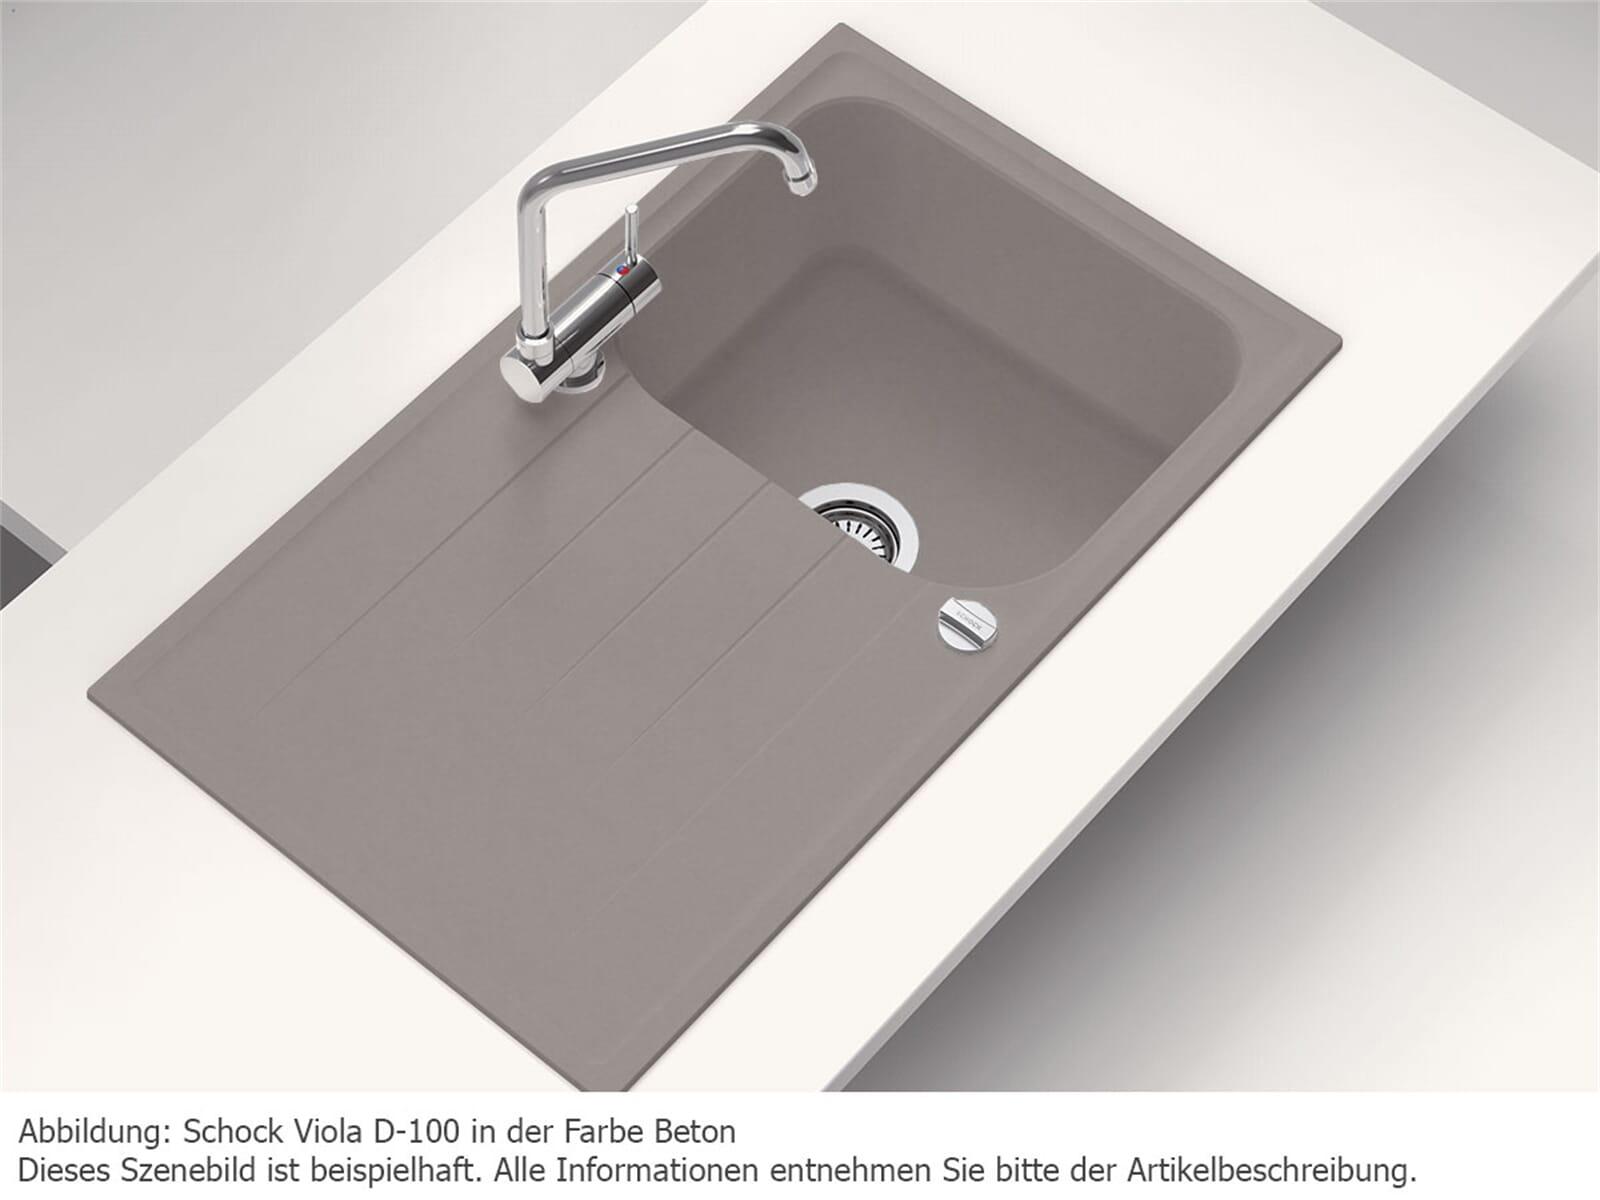 Schock Viola D-100 A Croma Granitspüle